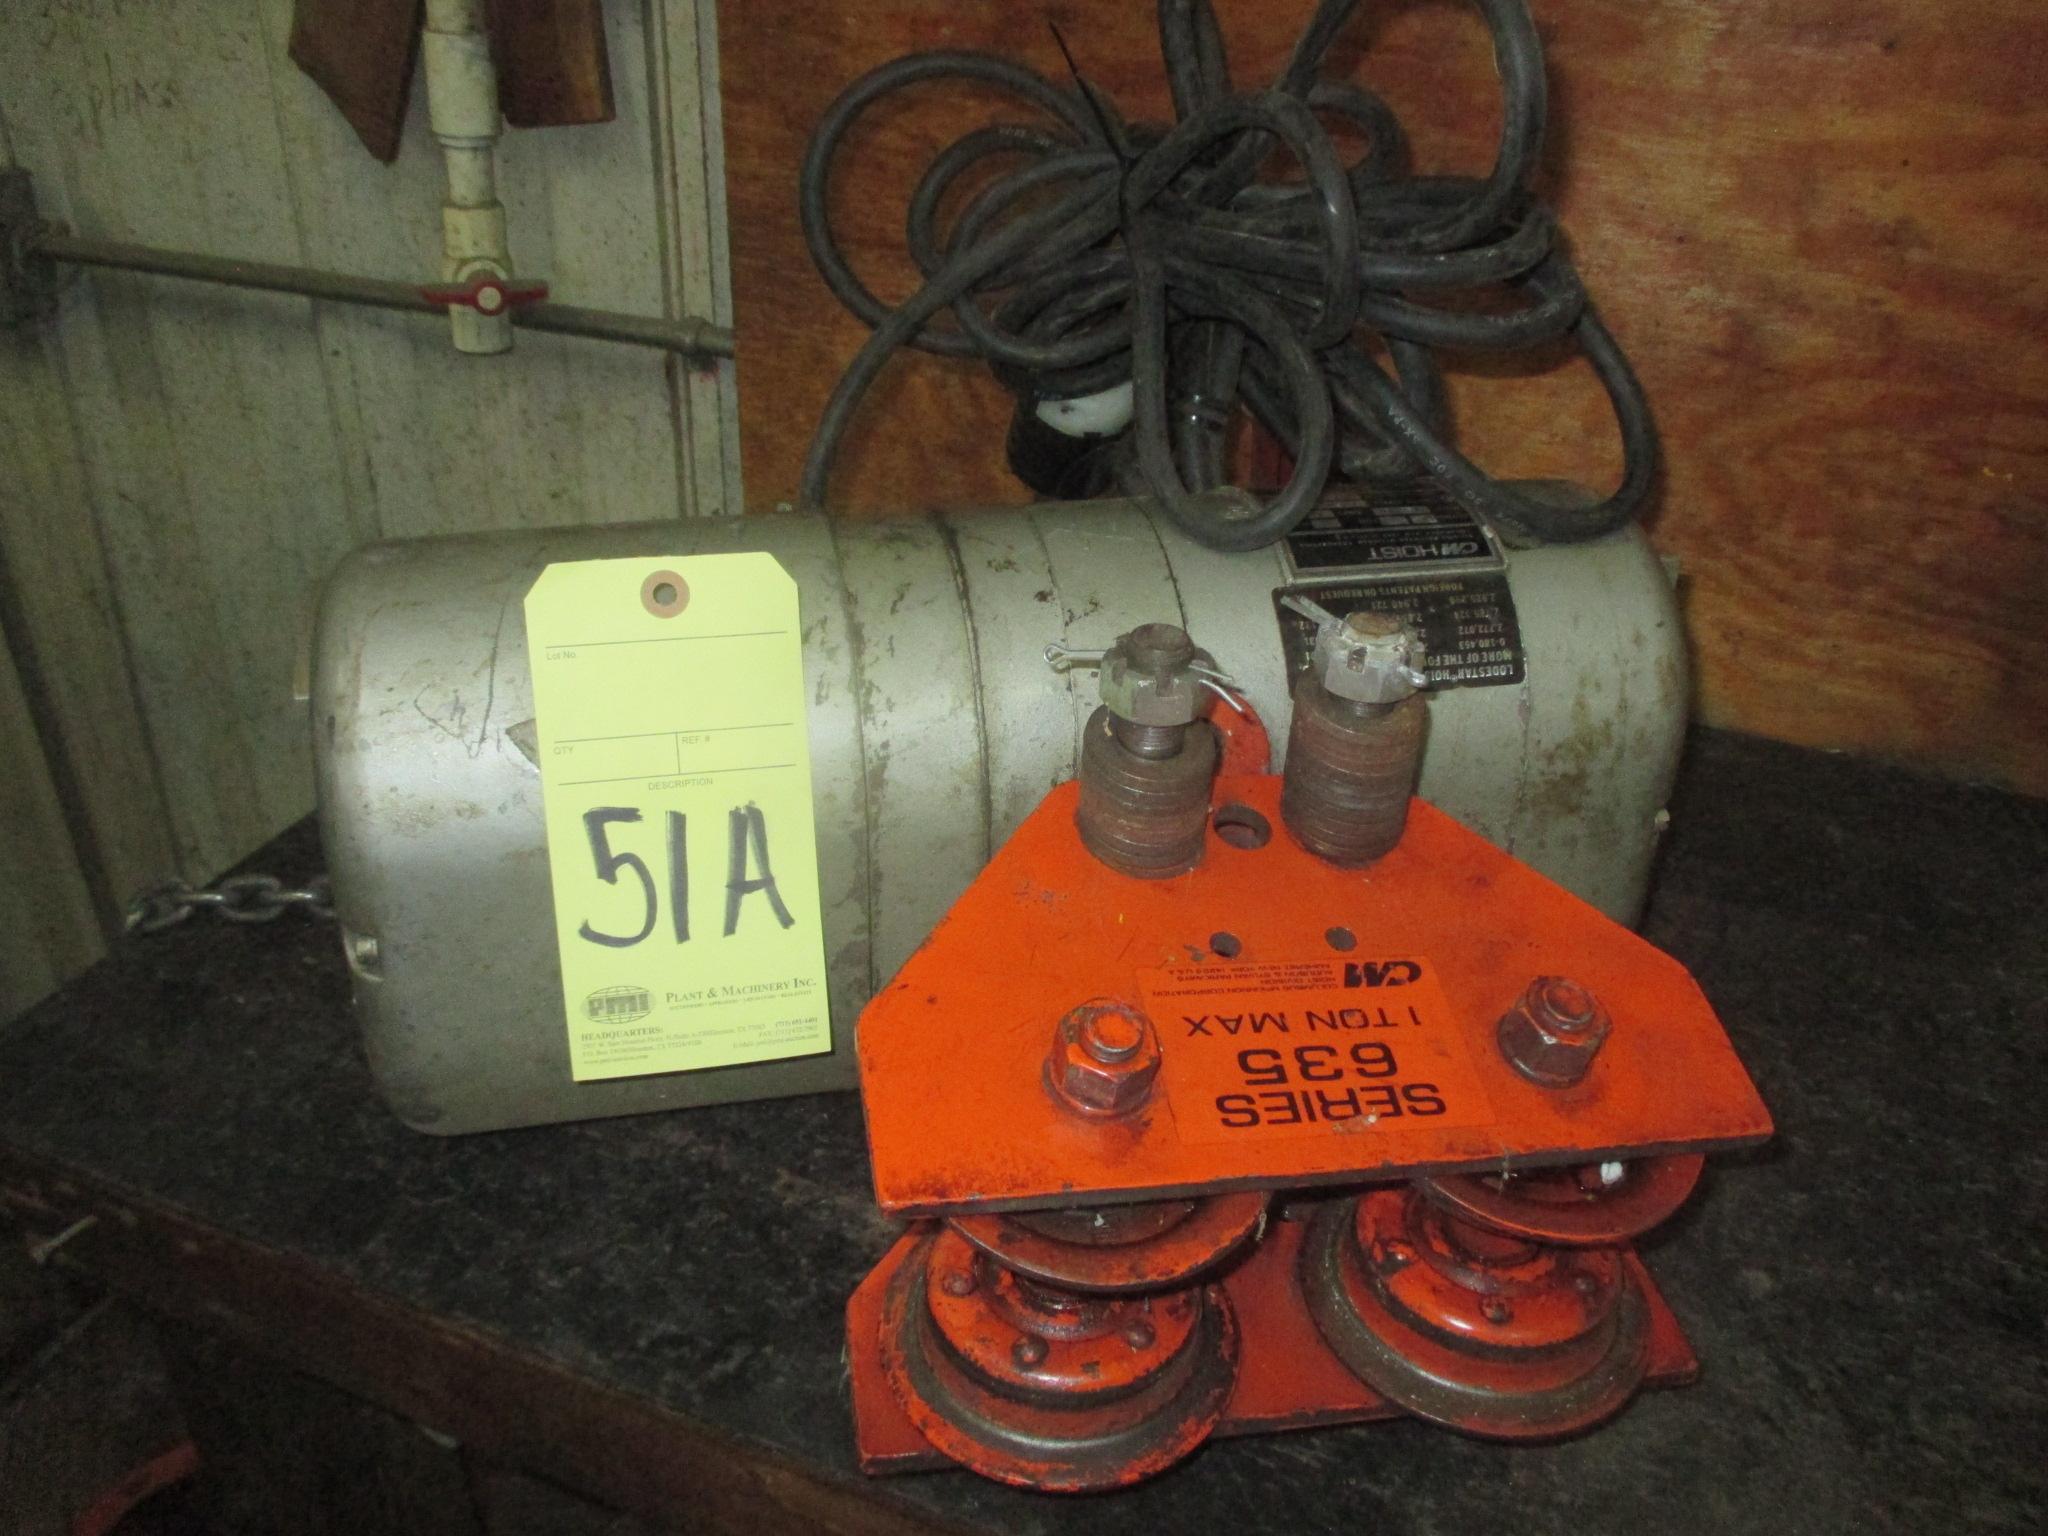 Lot 51A - ELECTRIC CHAIN HOIST, C&M, 1/2T.